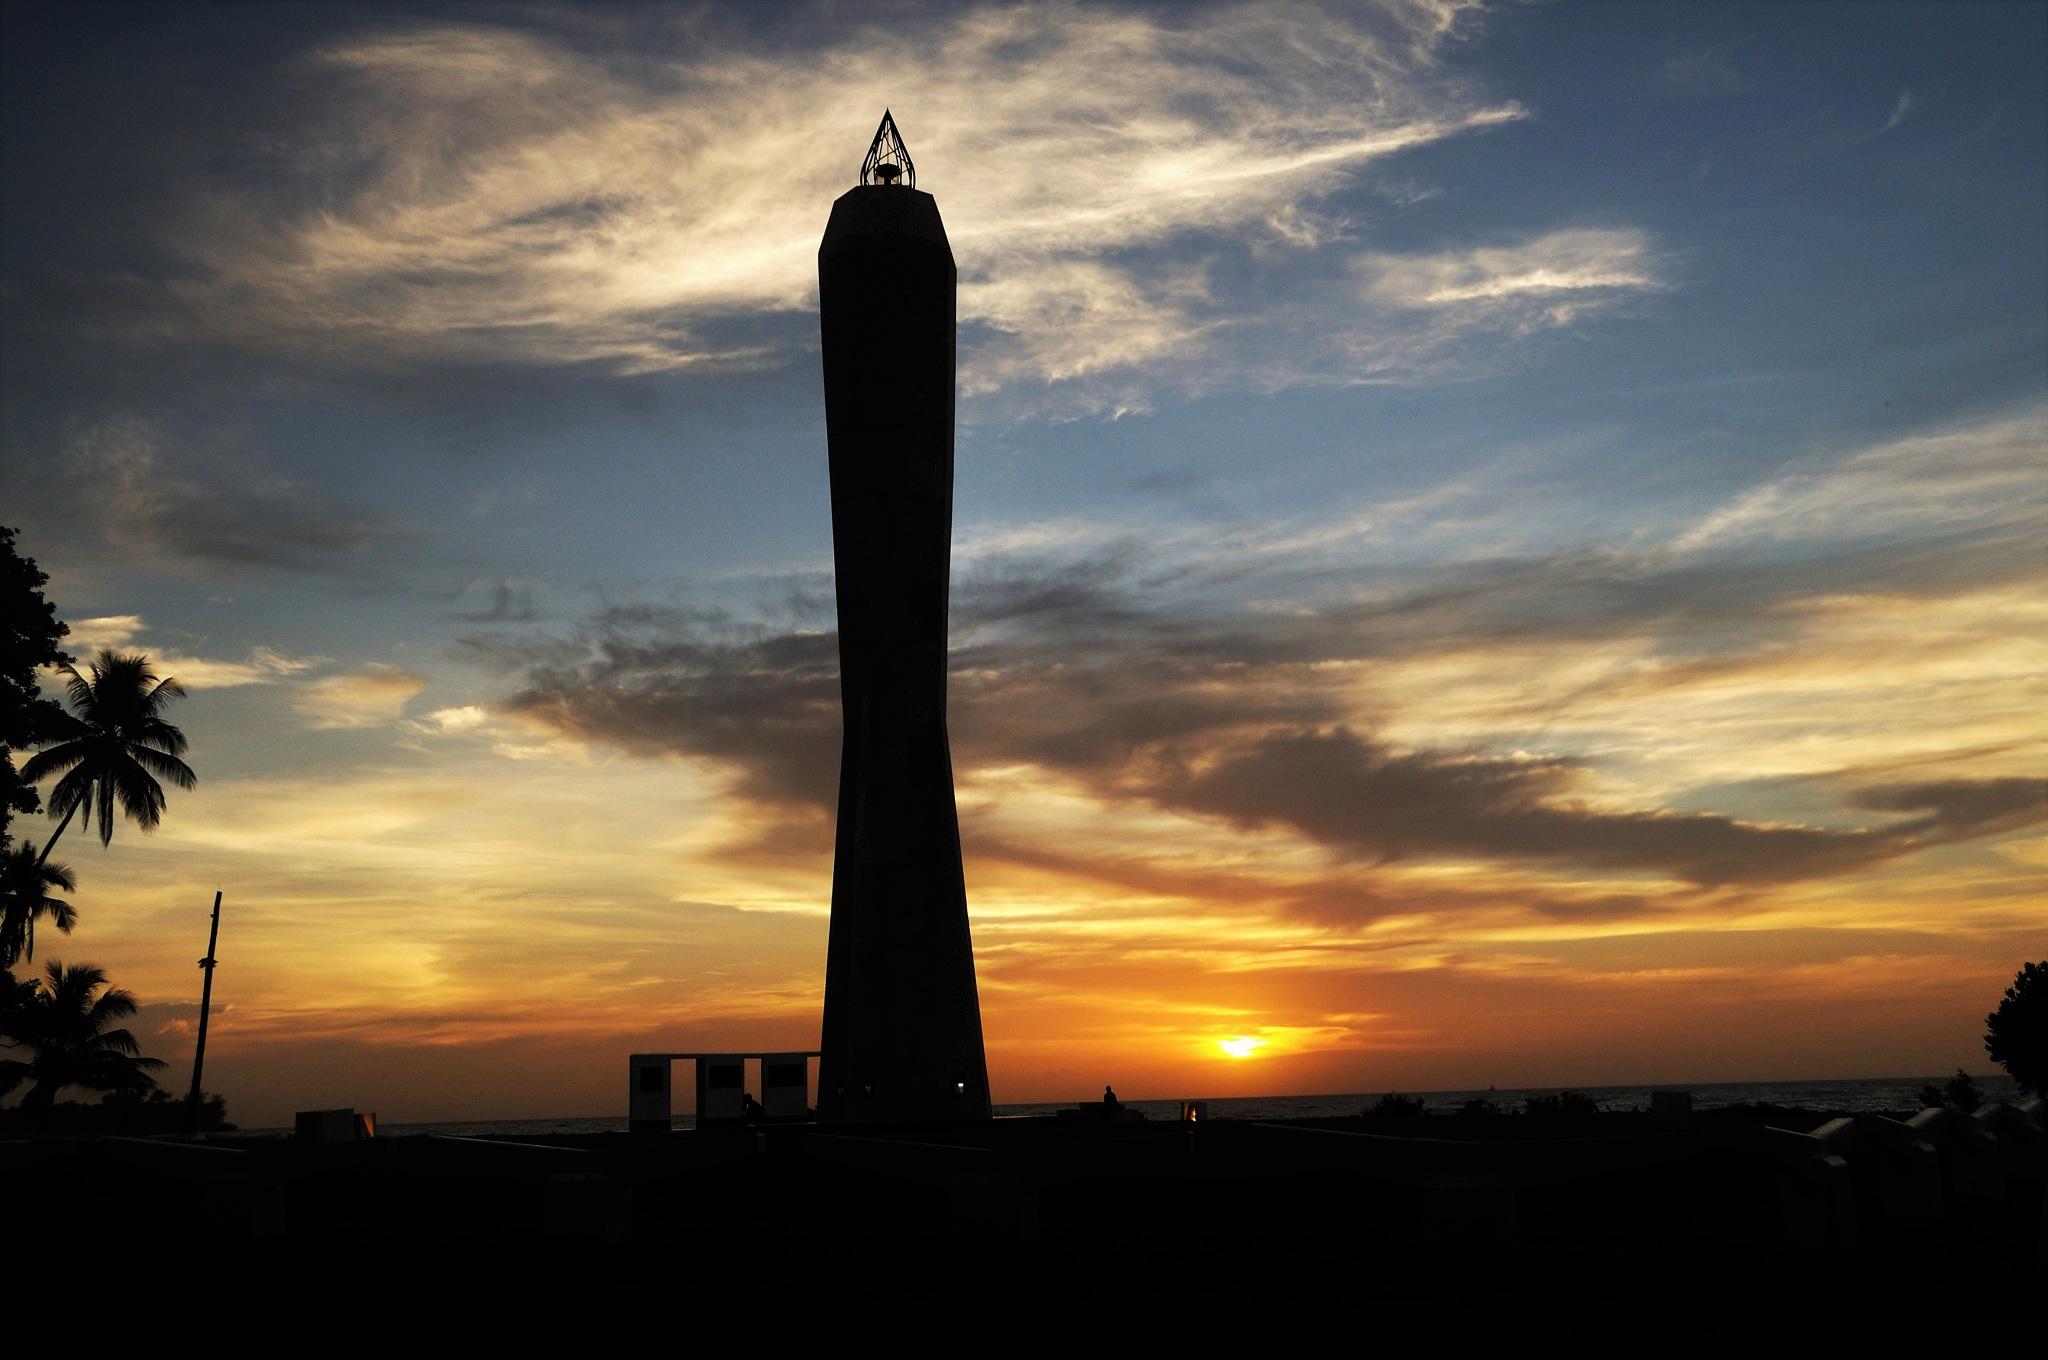 Beacon of Hope by Jess E